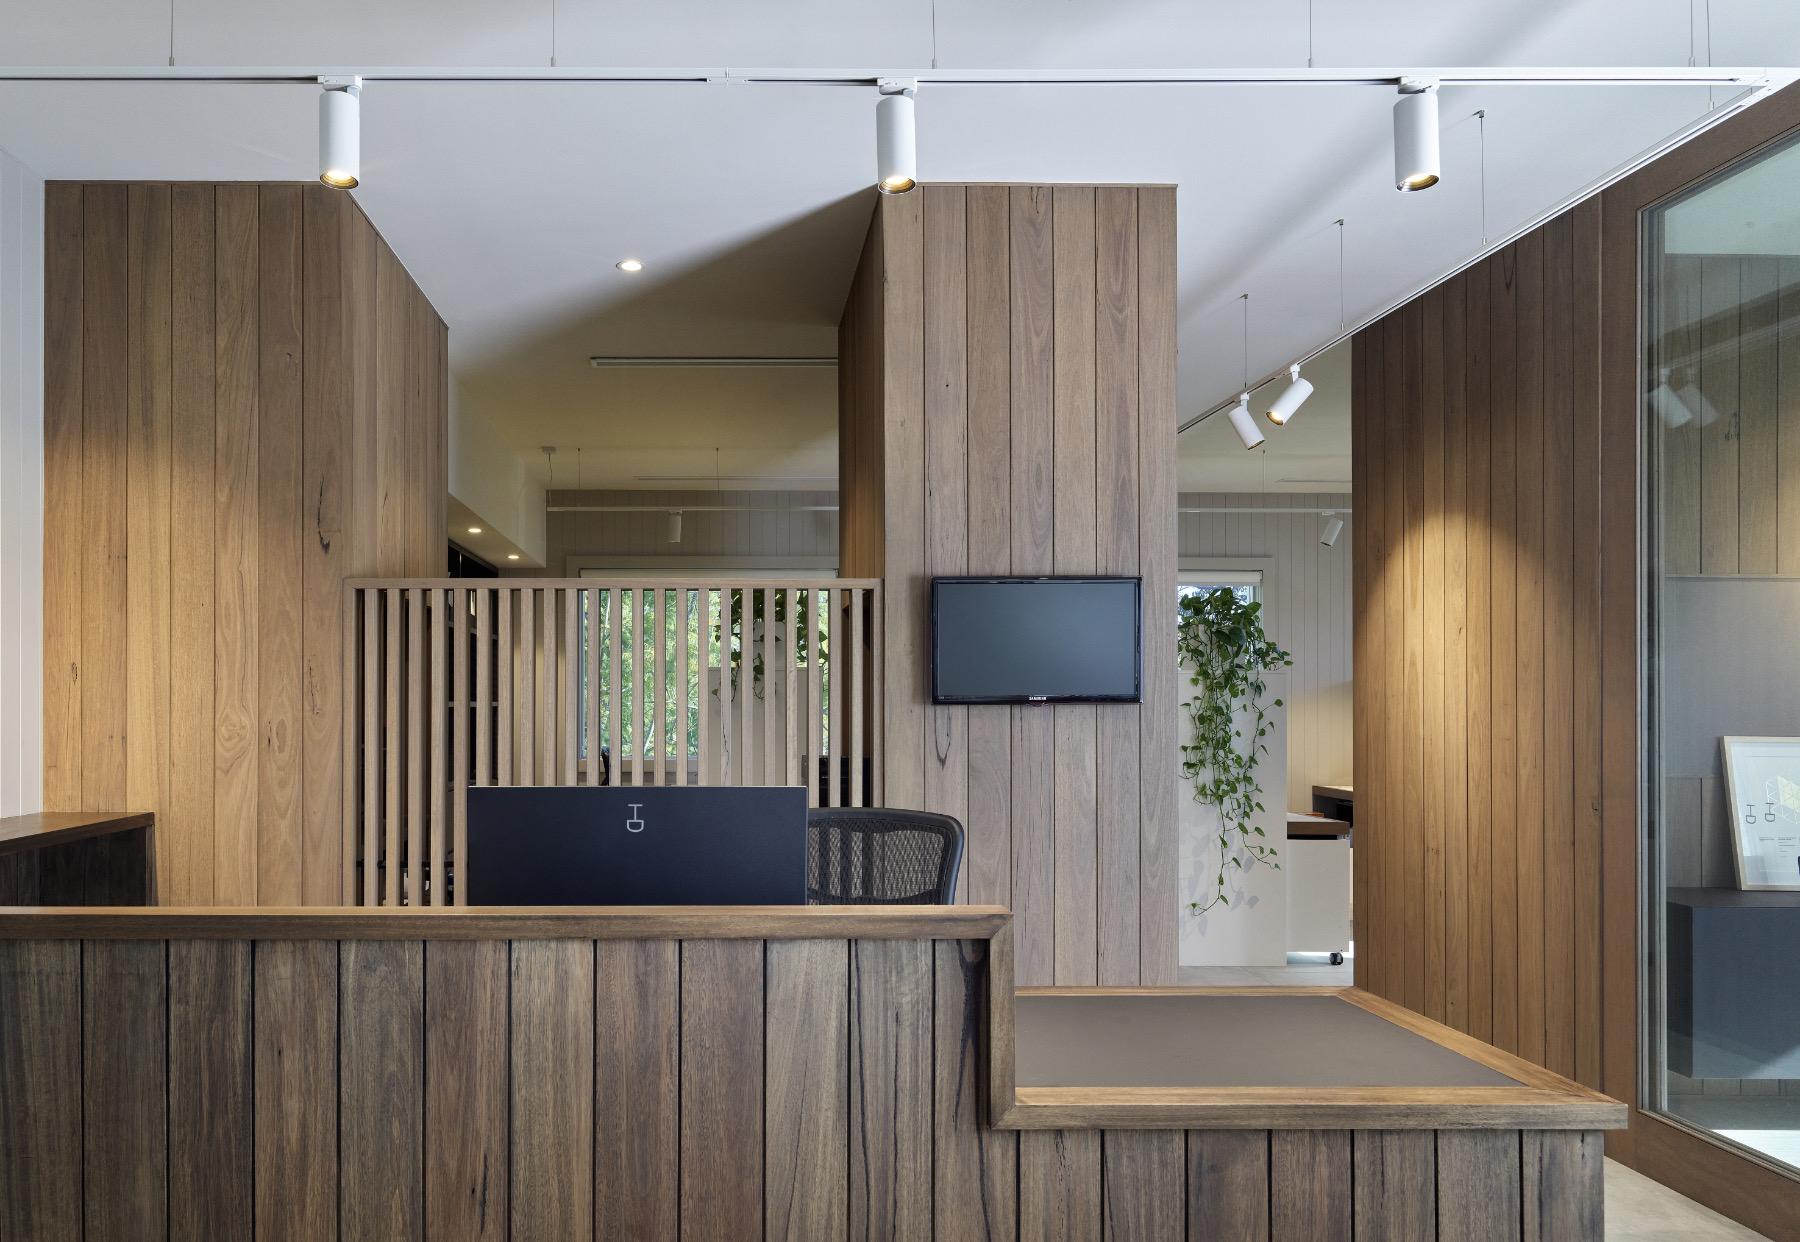 Tim Ditchfield Architects